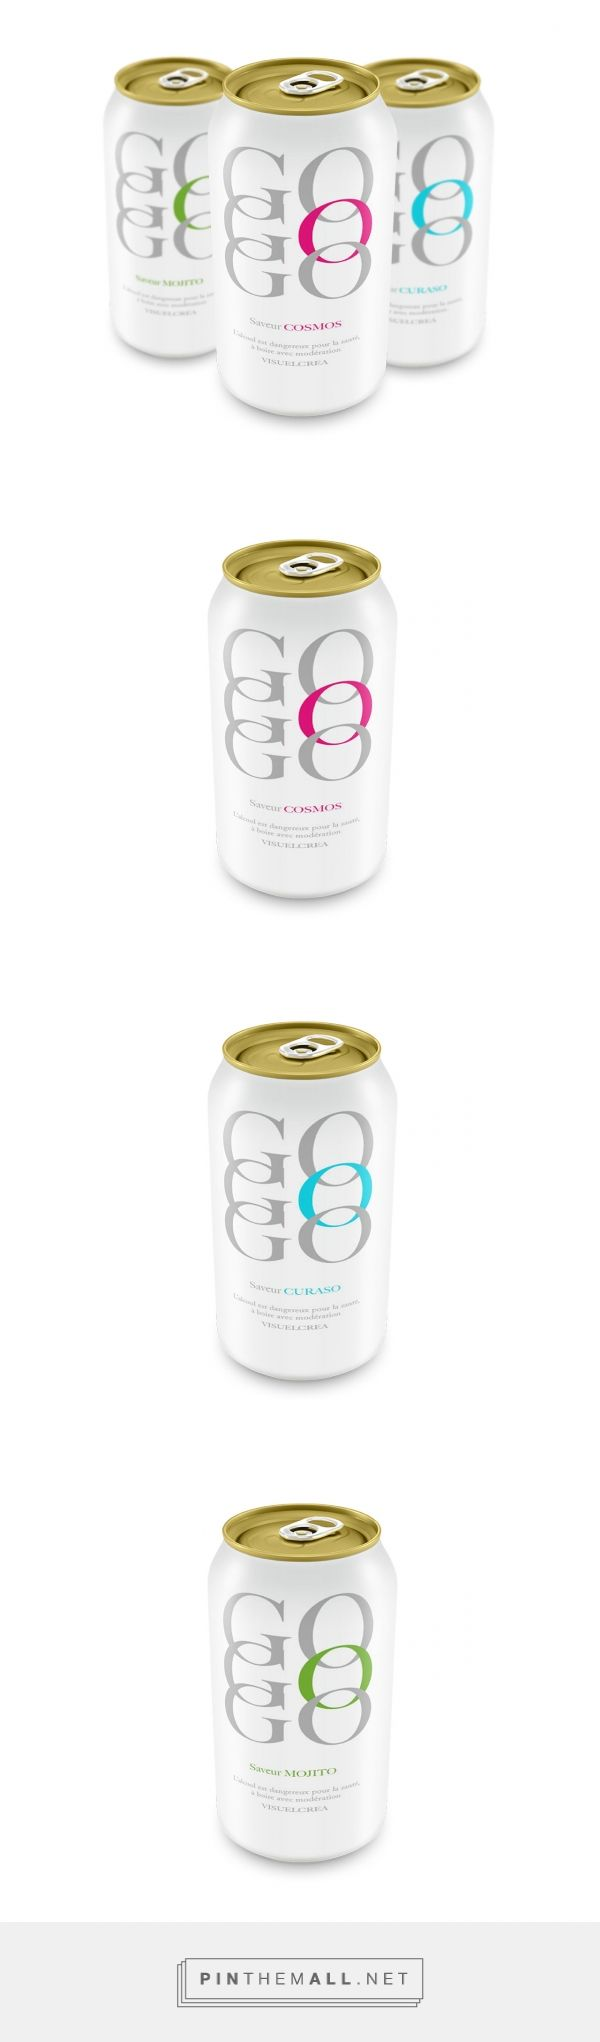 GO GO GO (Concept) - Packaging of the World - Creative Package Design Gallery - http://www.packagingoftheworld.com/2017/02/go-go-go-alcohol.html